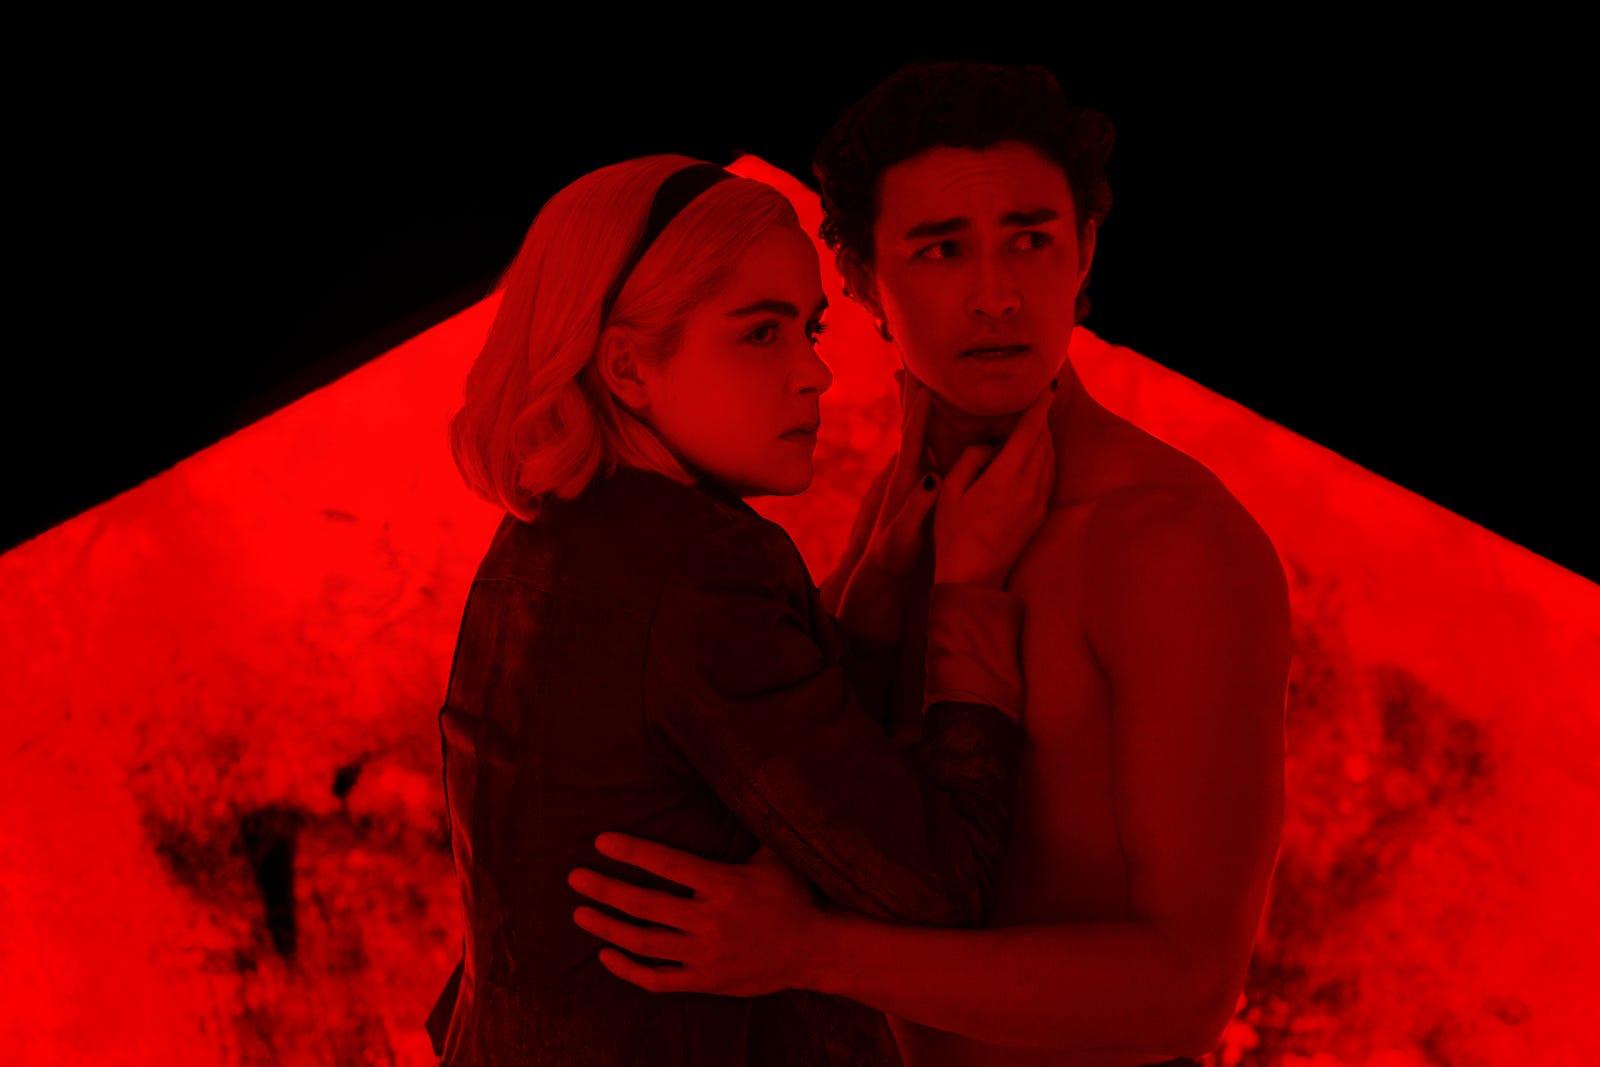 Sabrina (Kiernan Shipka) and Nicholas Scratch (Gavin Leatherwood) reunite in Hell. All photos: Netflix.